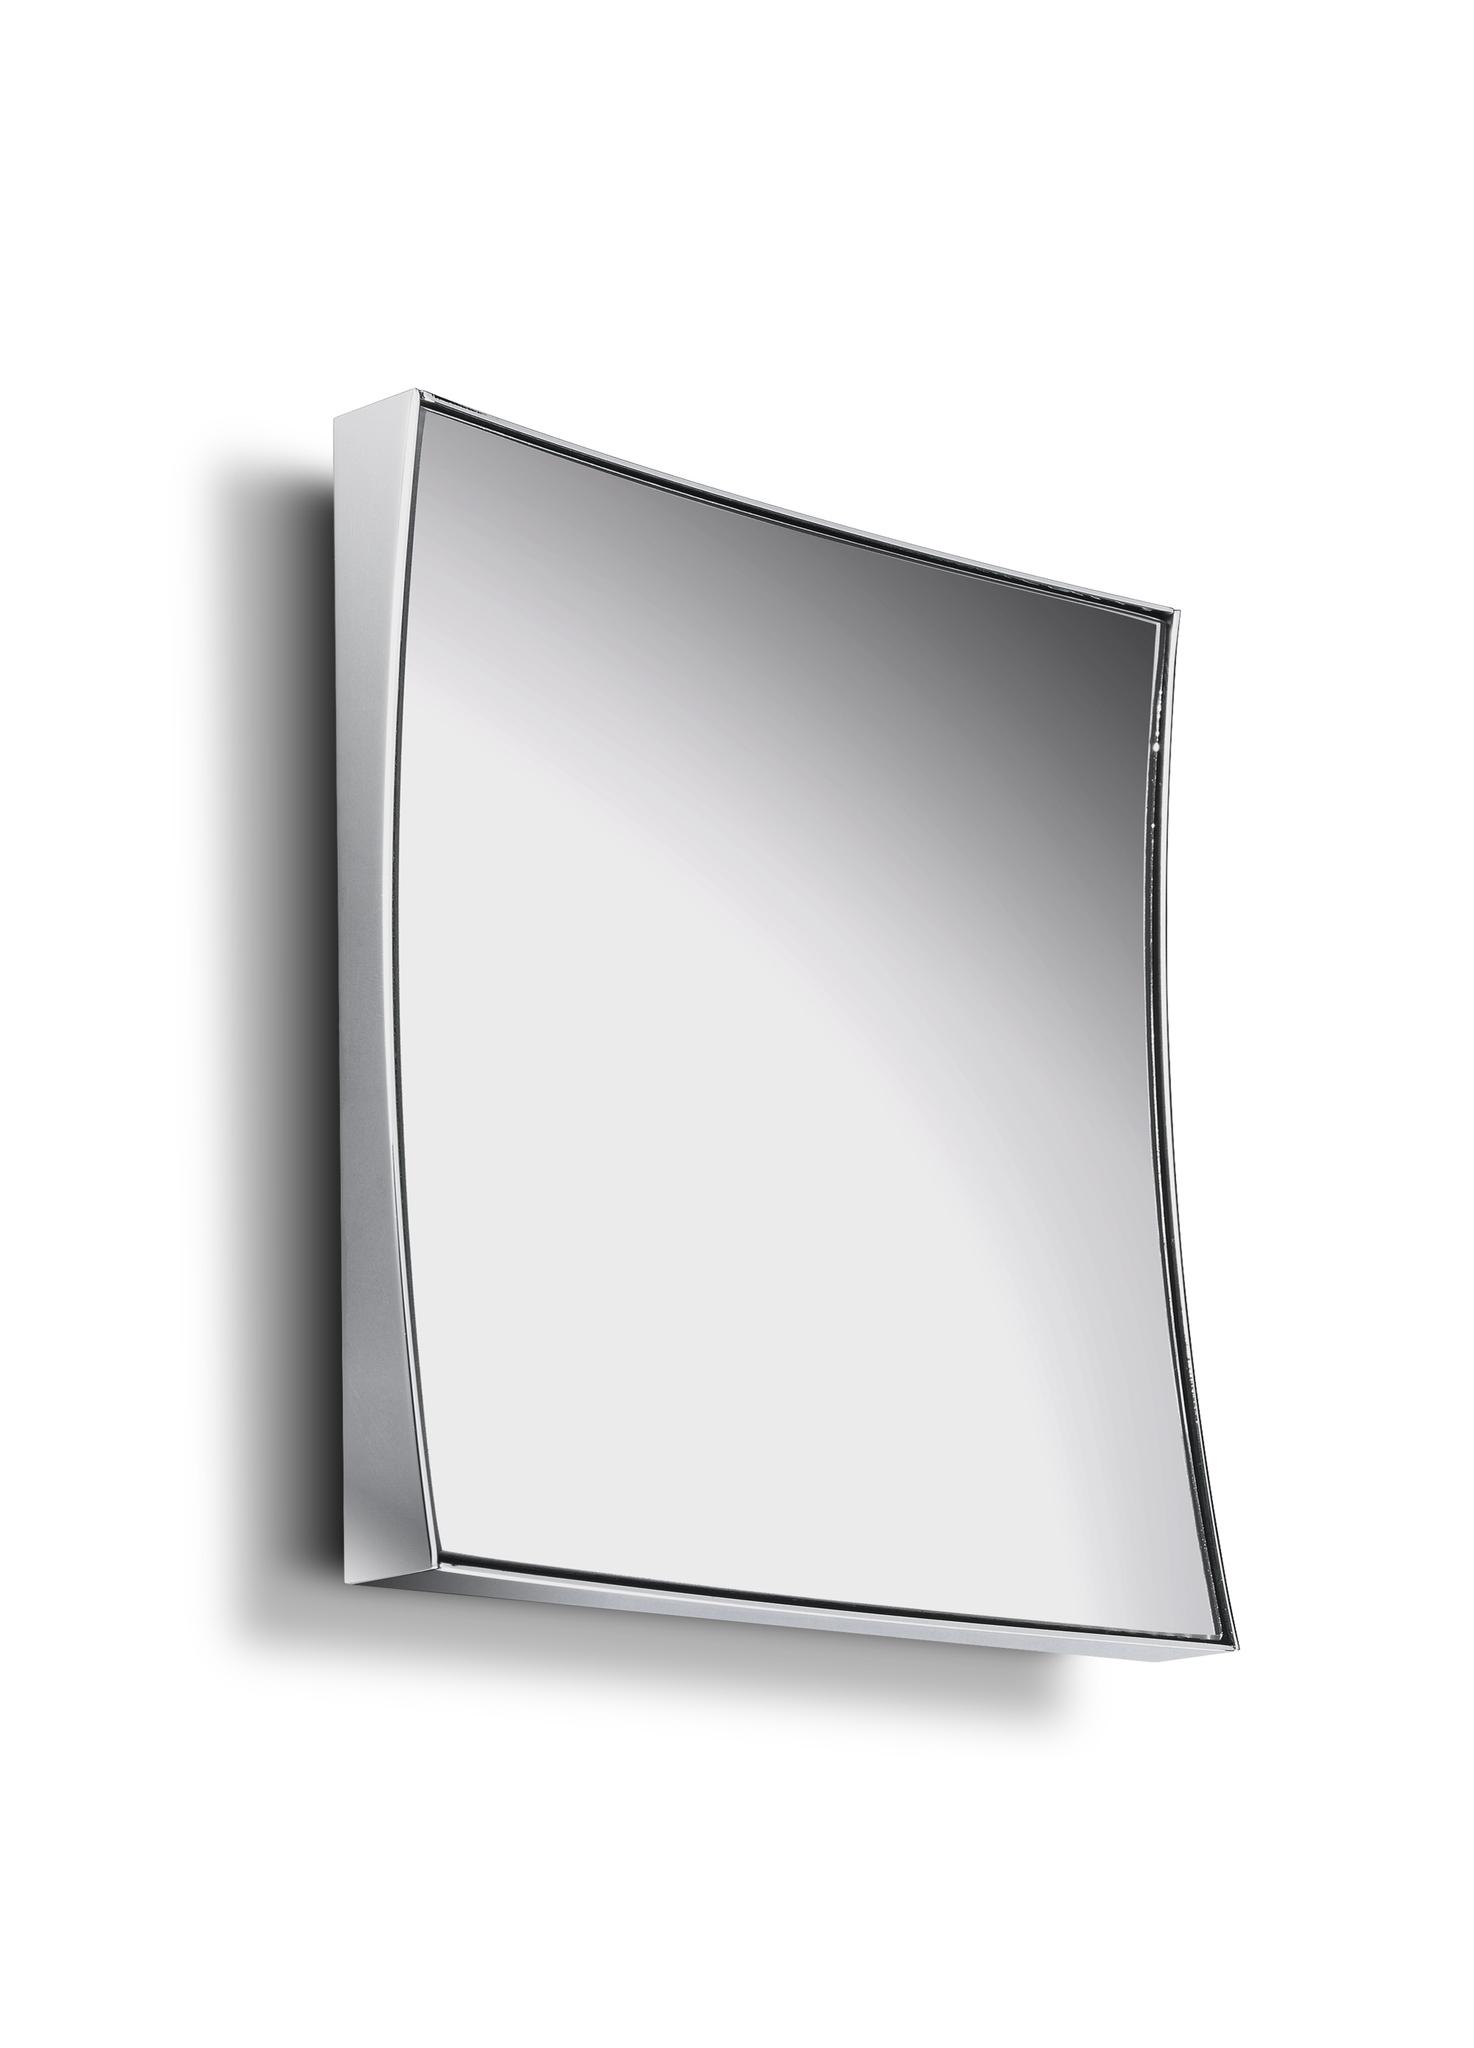 Зеркала Элитное зеркало косметическое на присосках 99305O 3X от Windisch elitnoe-zerkalo-kosmeticheskoe-na-prisoskah-99305-ot-windisch-ispaniya.jpg